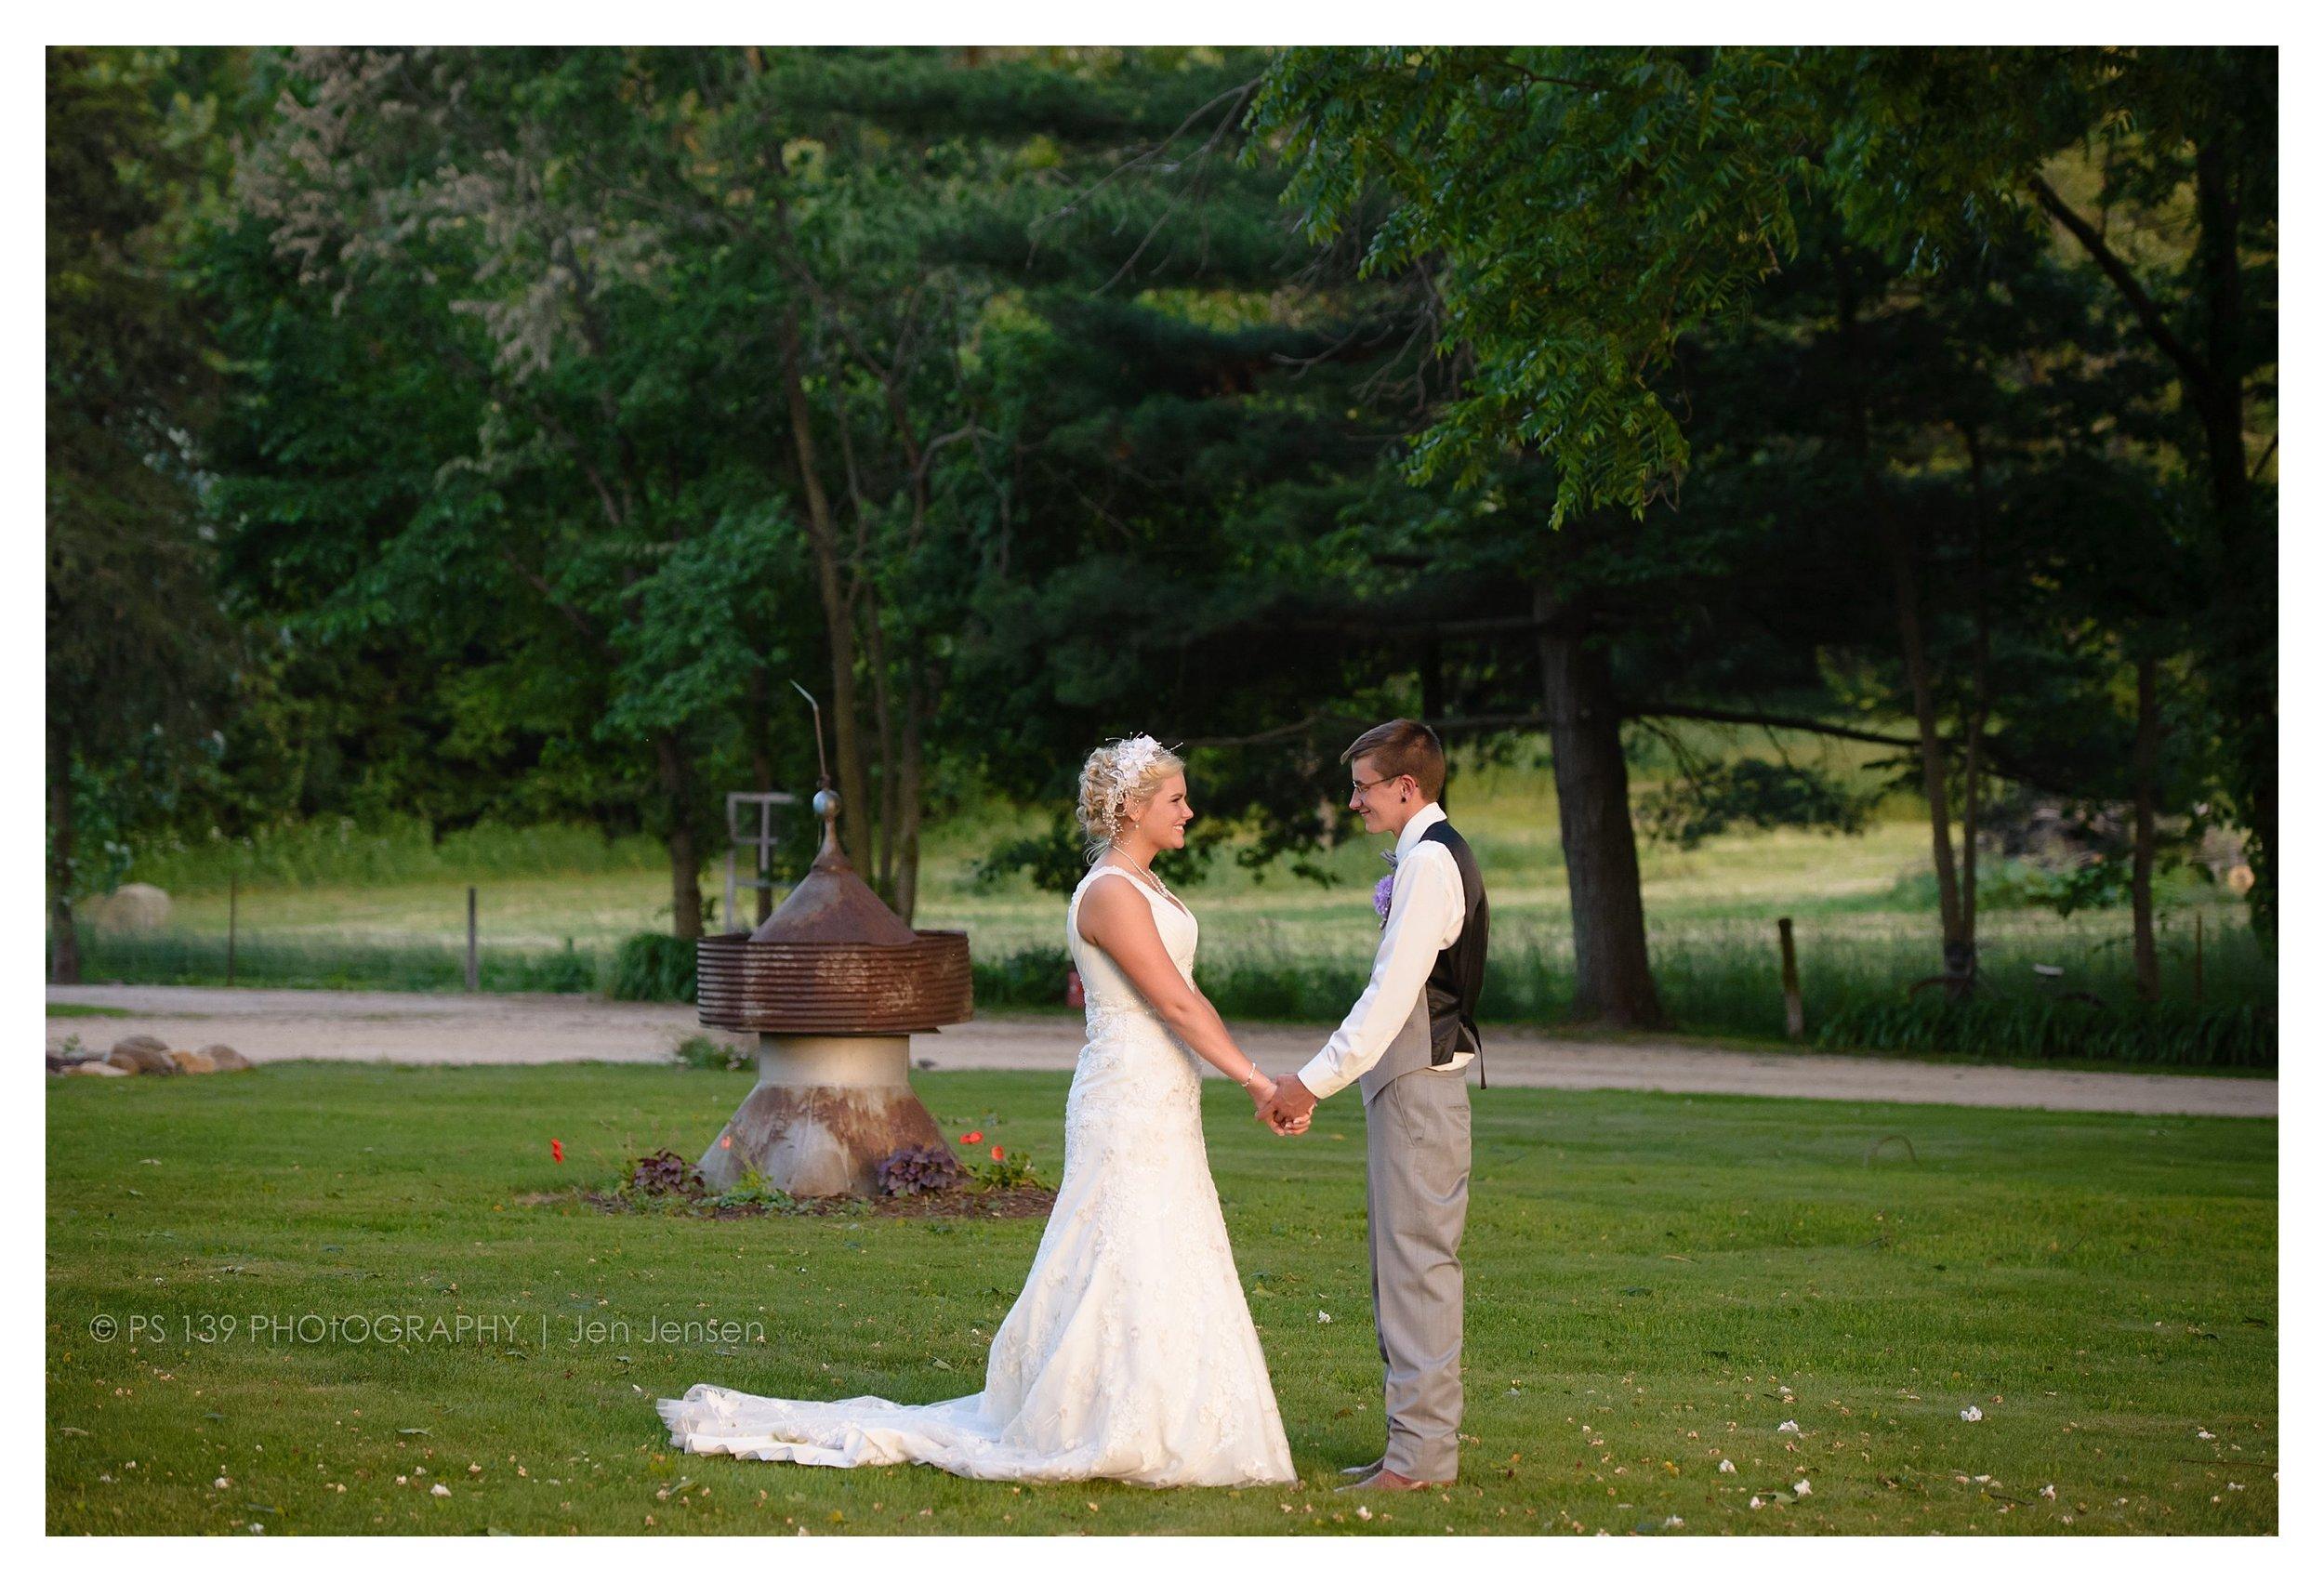 oregon Illinois oak lane farm wisconsin wedding photographer bayfield wi ps 139 photography jen jensen_0253.jpg